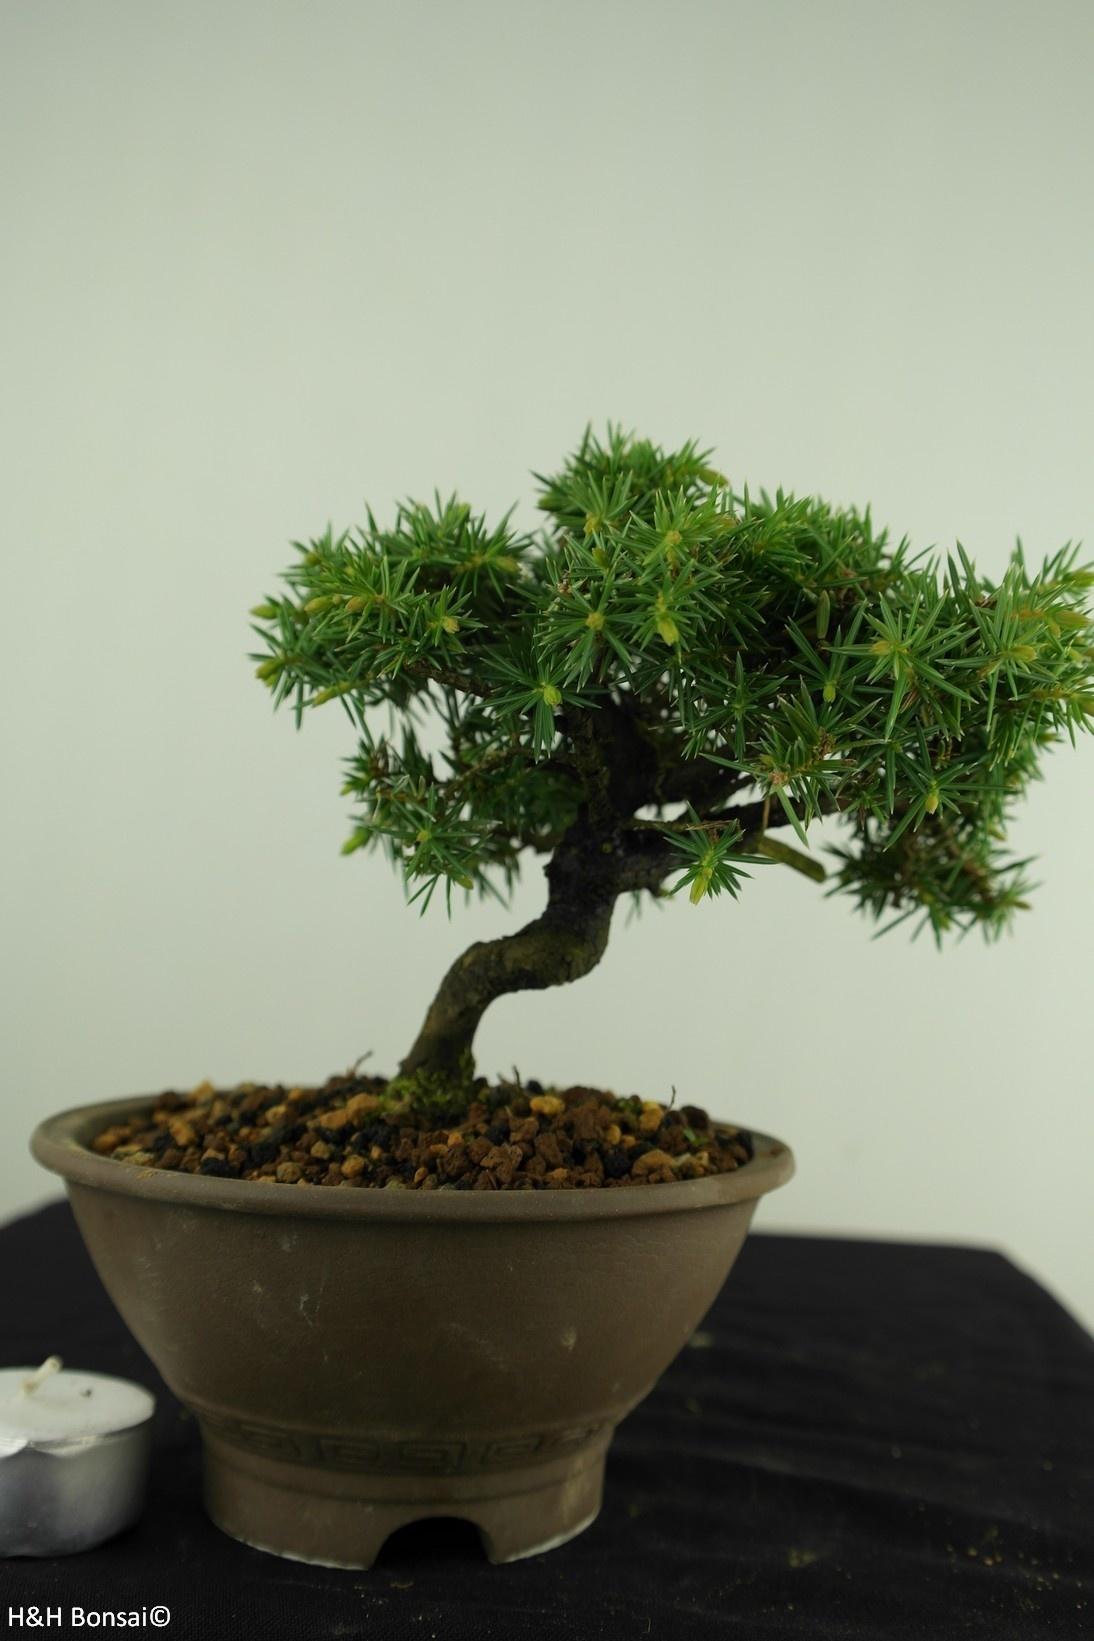 Bonsai Shohin Needle Juniper, Juniperus regida, no. 7787